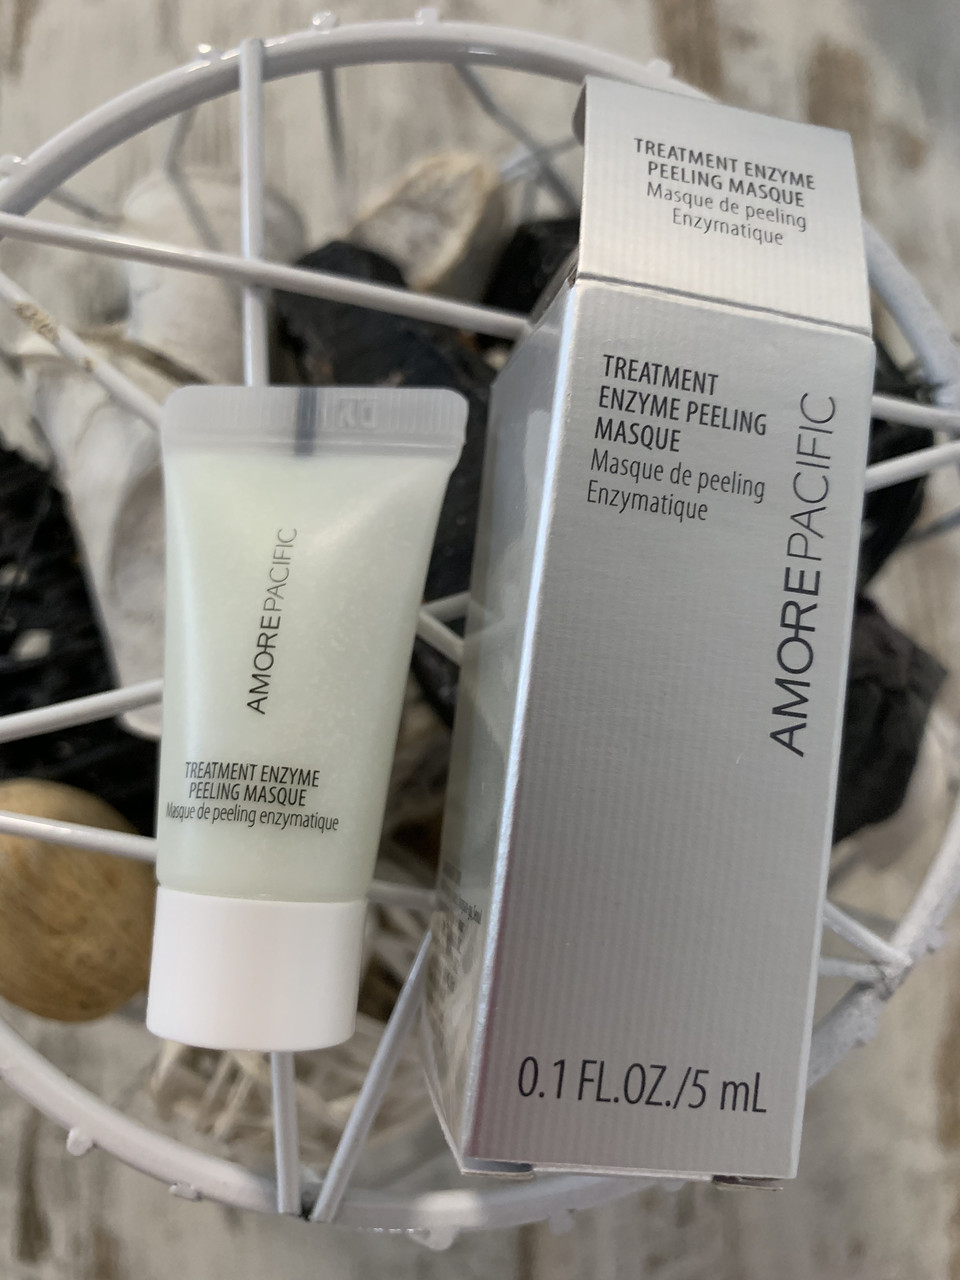 Маска-пилинг для лица AMOREPACIFIC Treatment Enzyme Peeling Masque